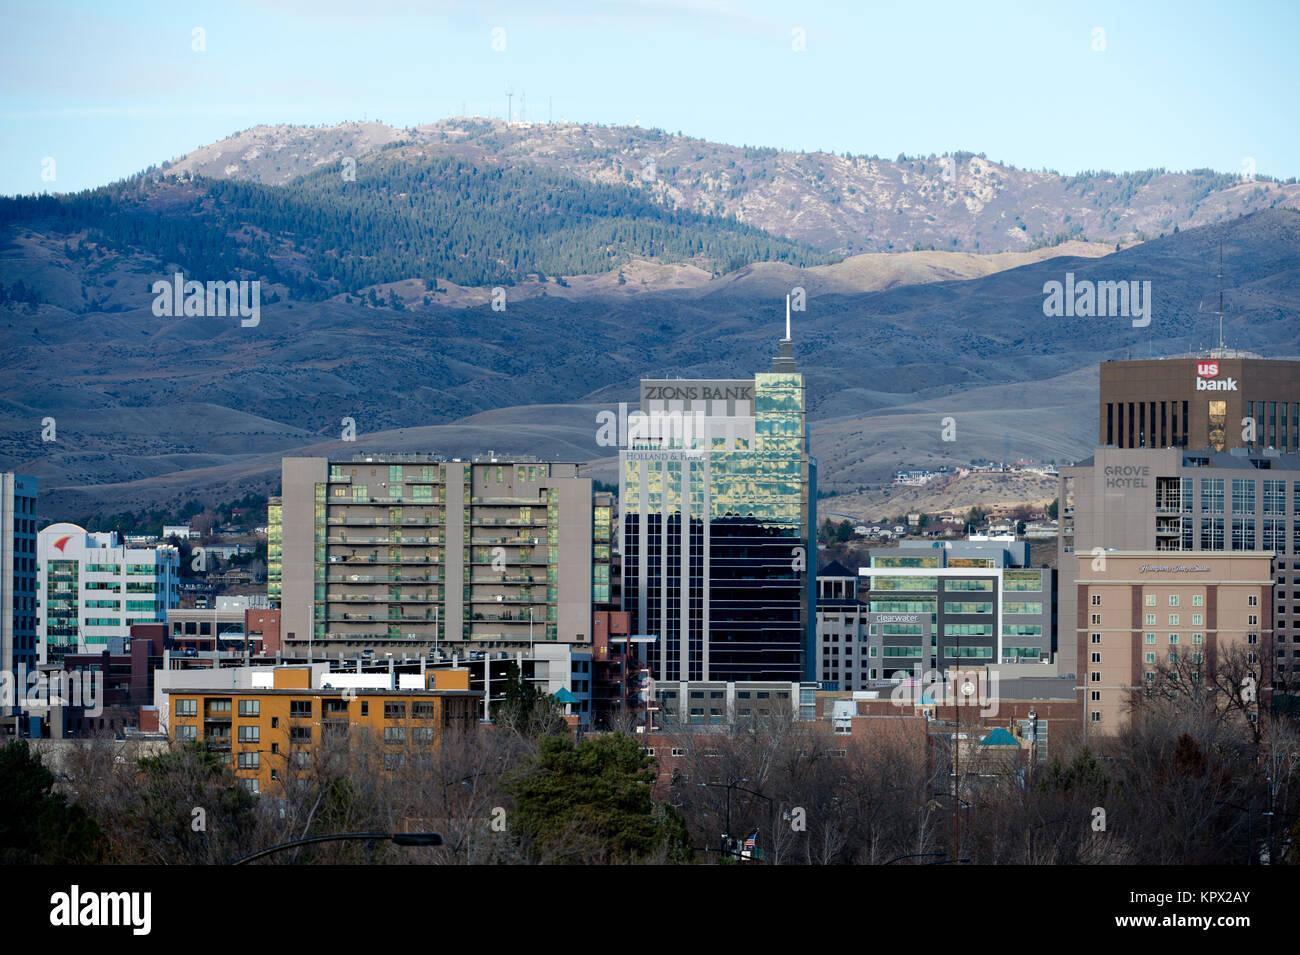 Boise Idaho cityscape in December 2017 - Stock Image